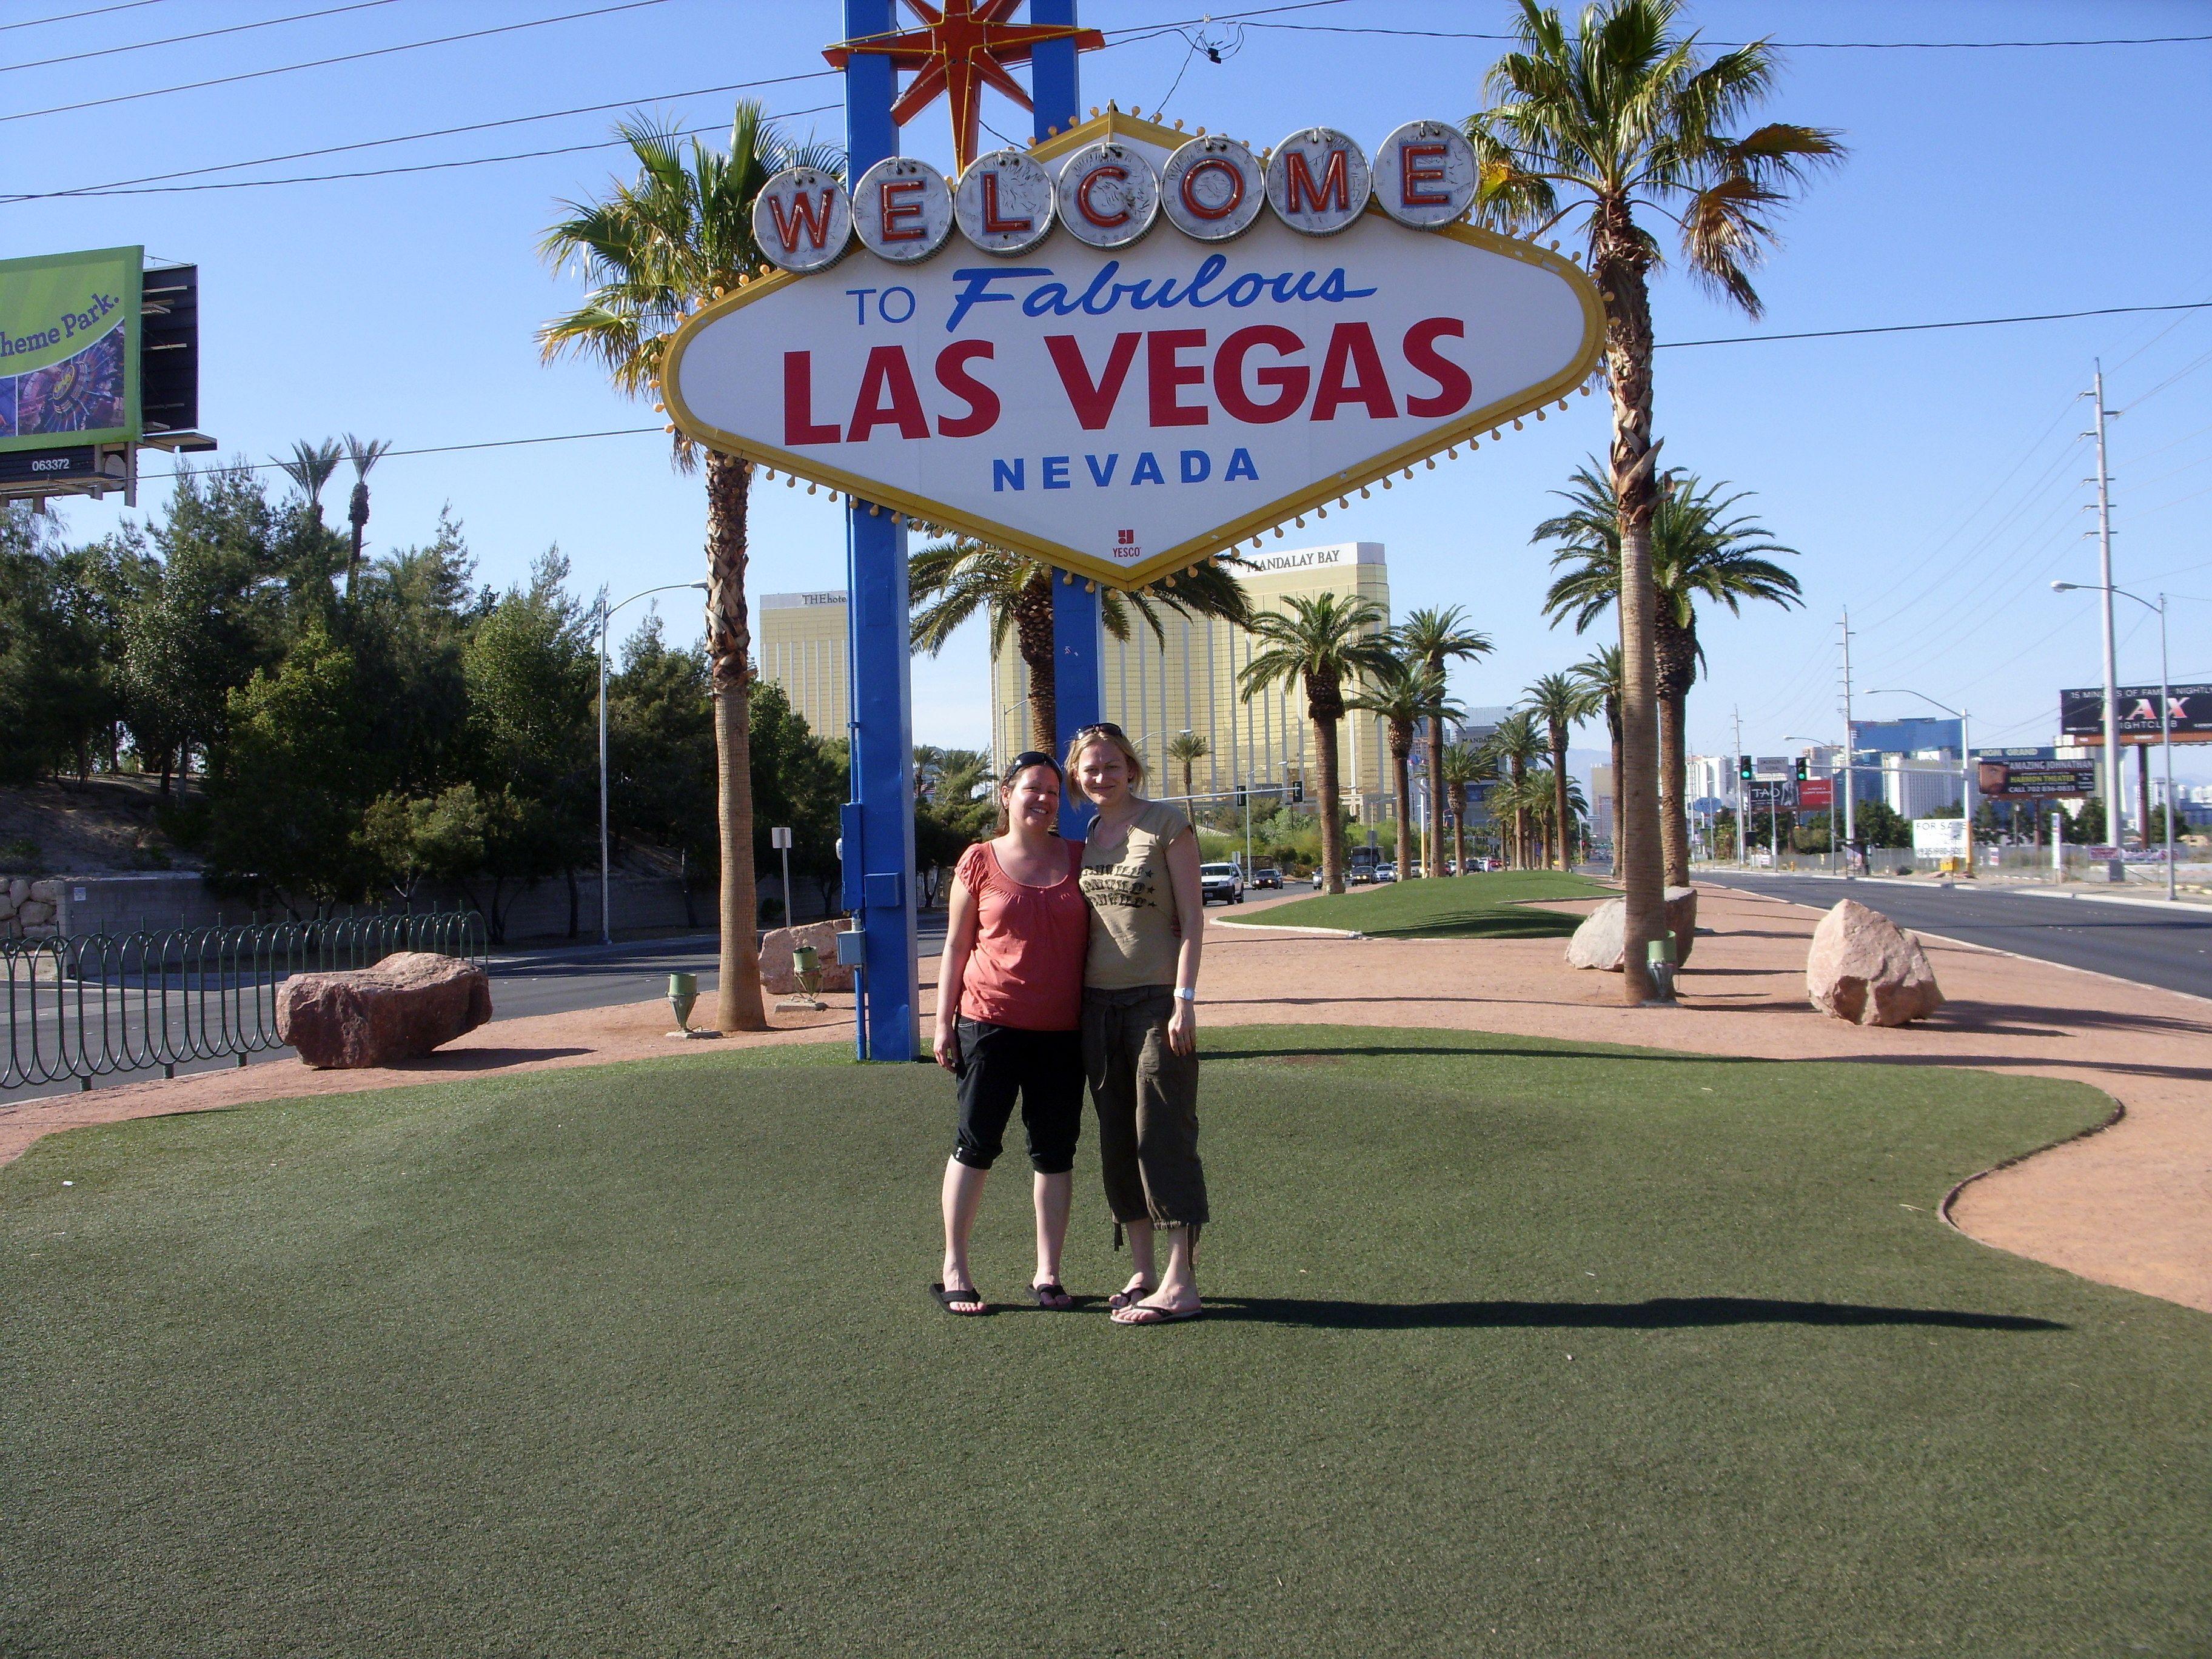 Globtrottergirls in Las Vegas